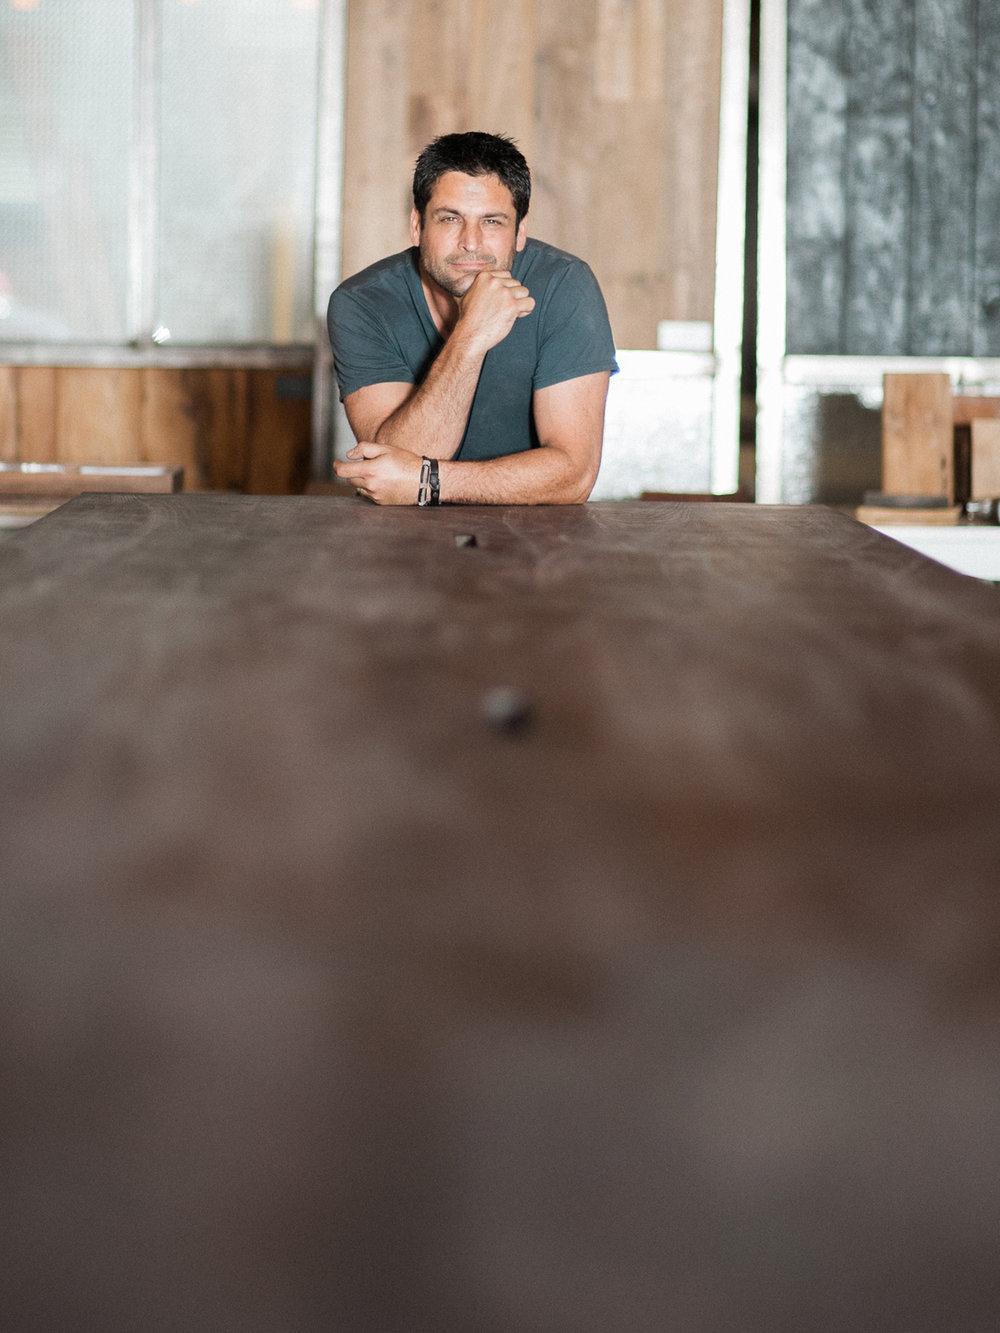 Mark Jupiter Designs DUMBO Brooklyn, NY custom board room table branding photo